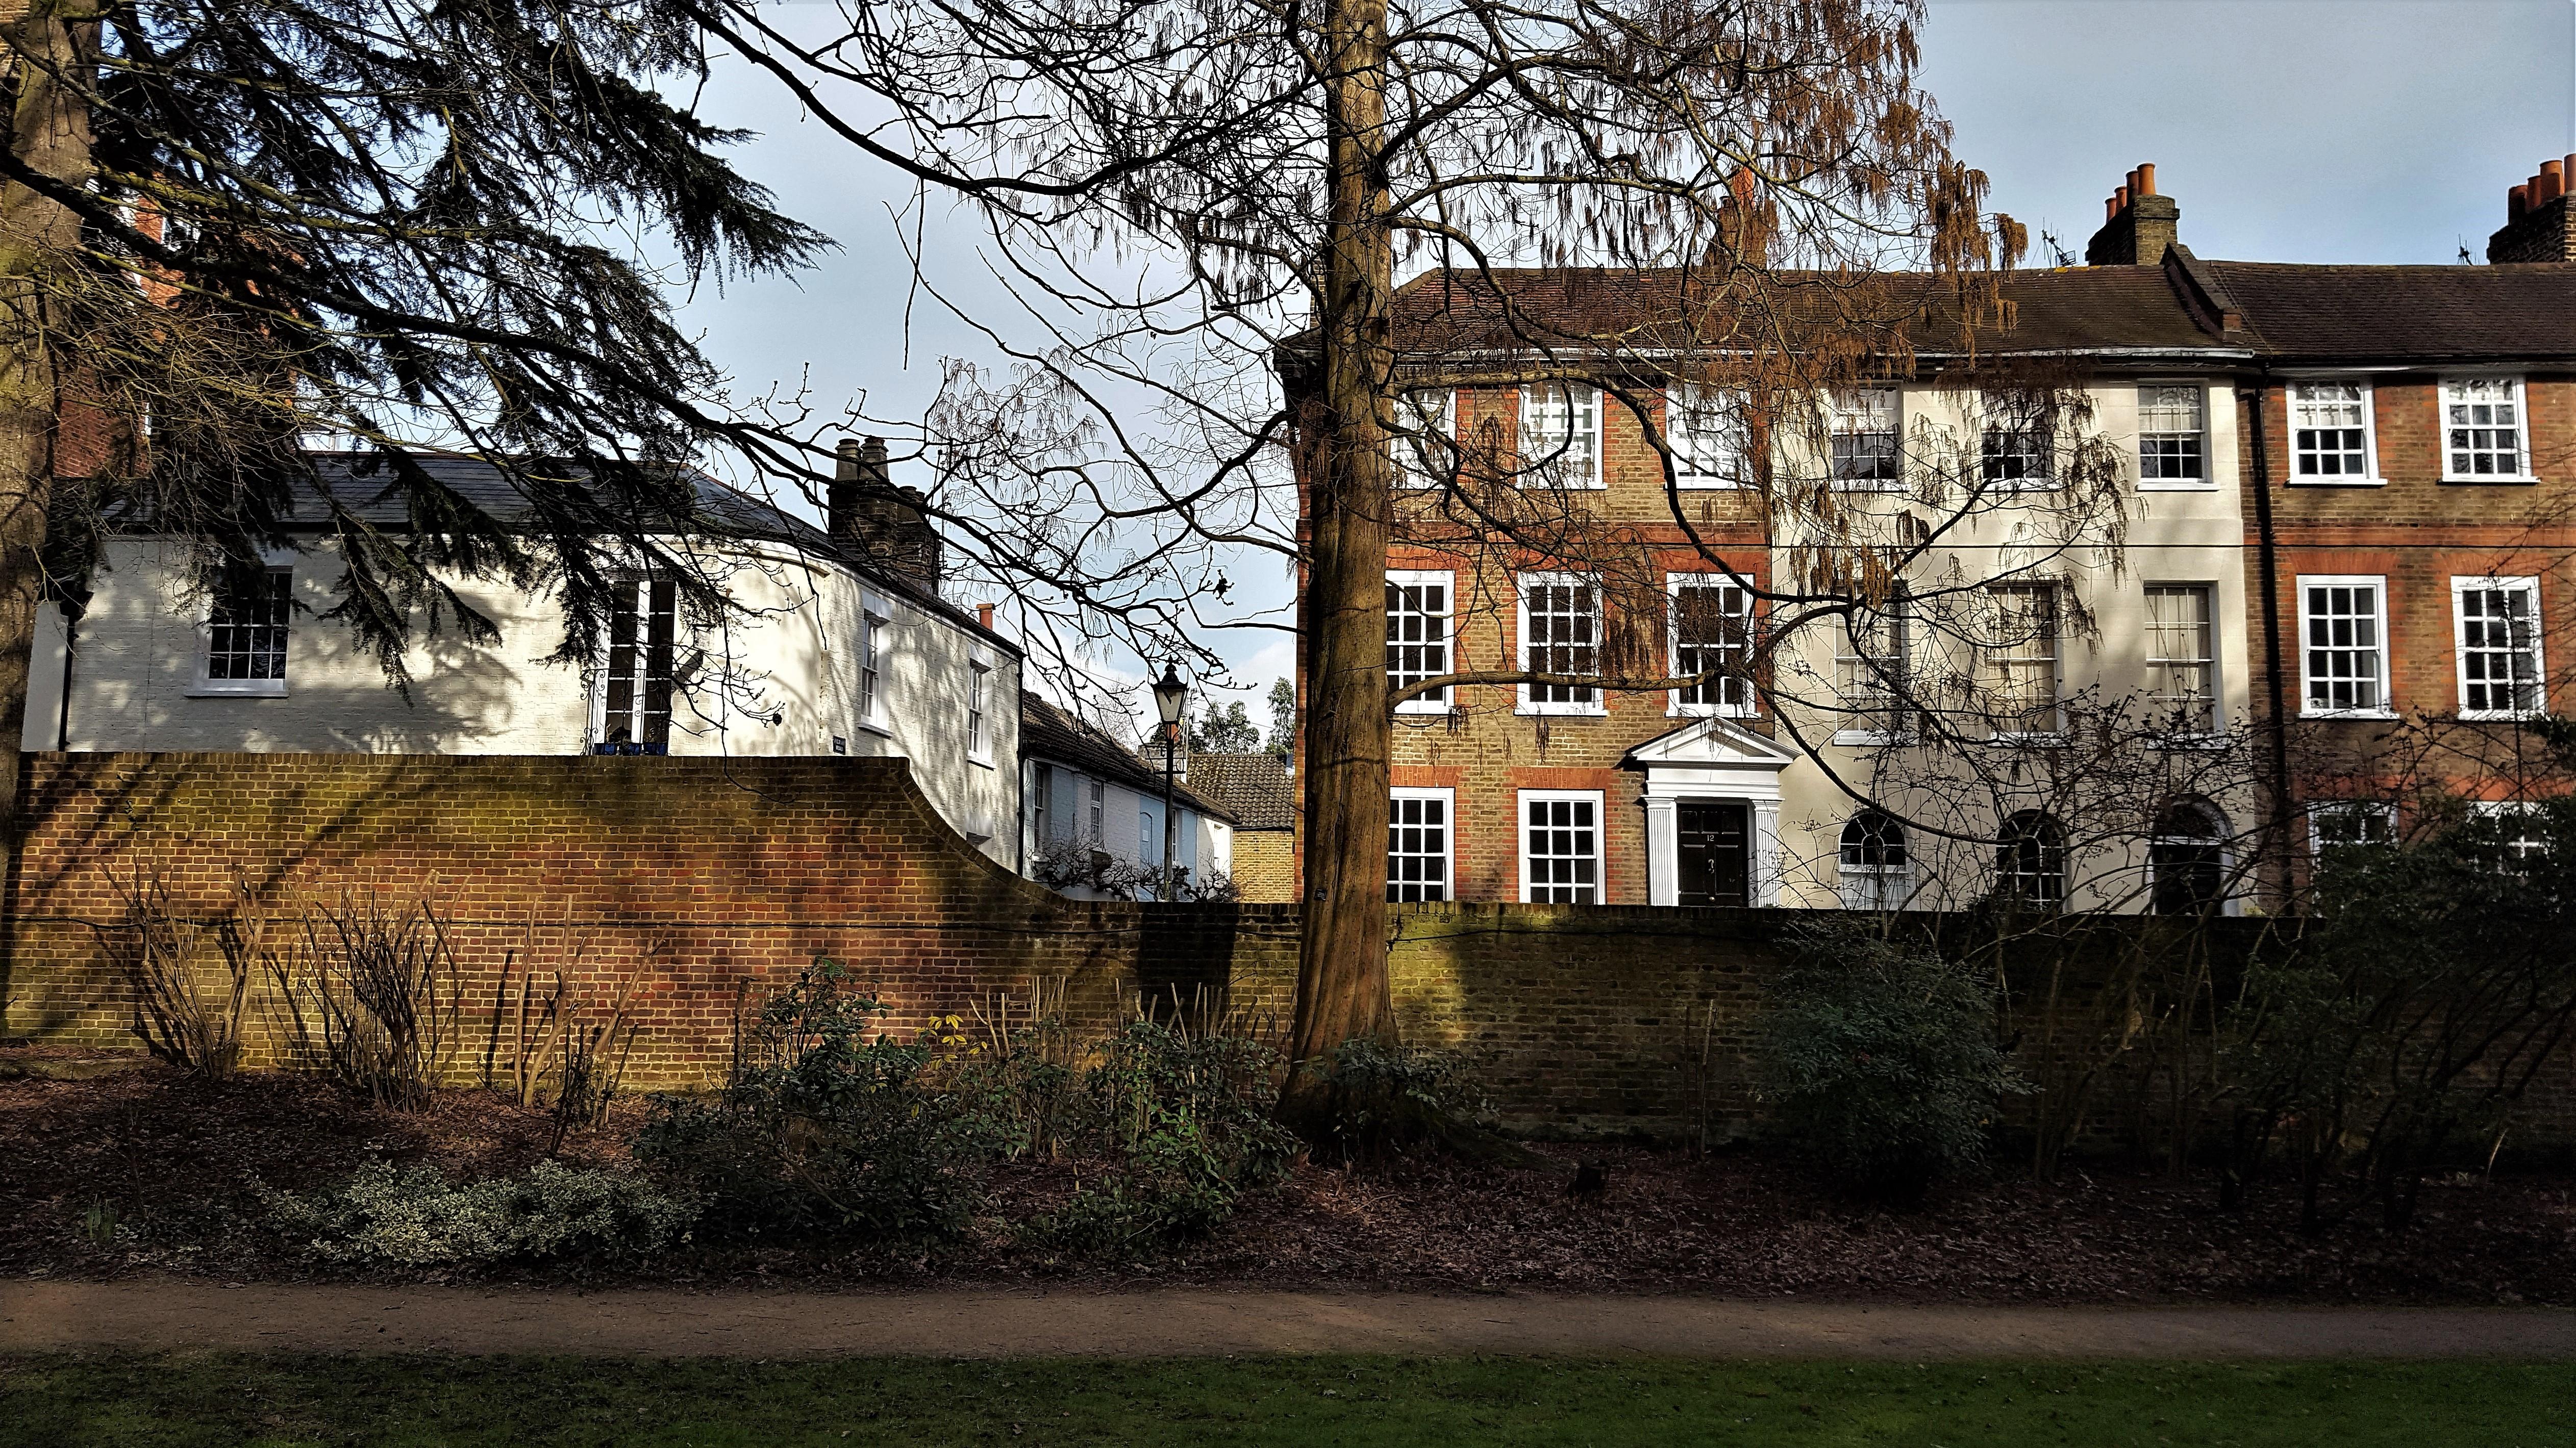 Wallpaper : trees, London, window, garden, city, apartments ...